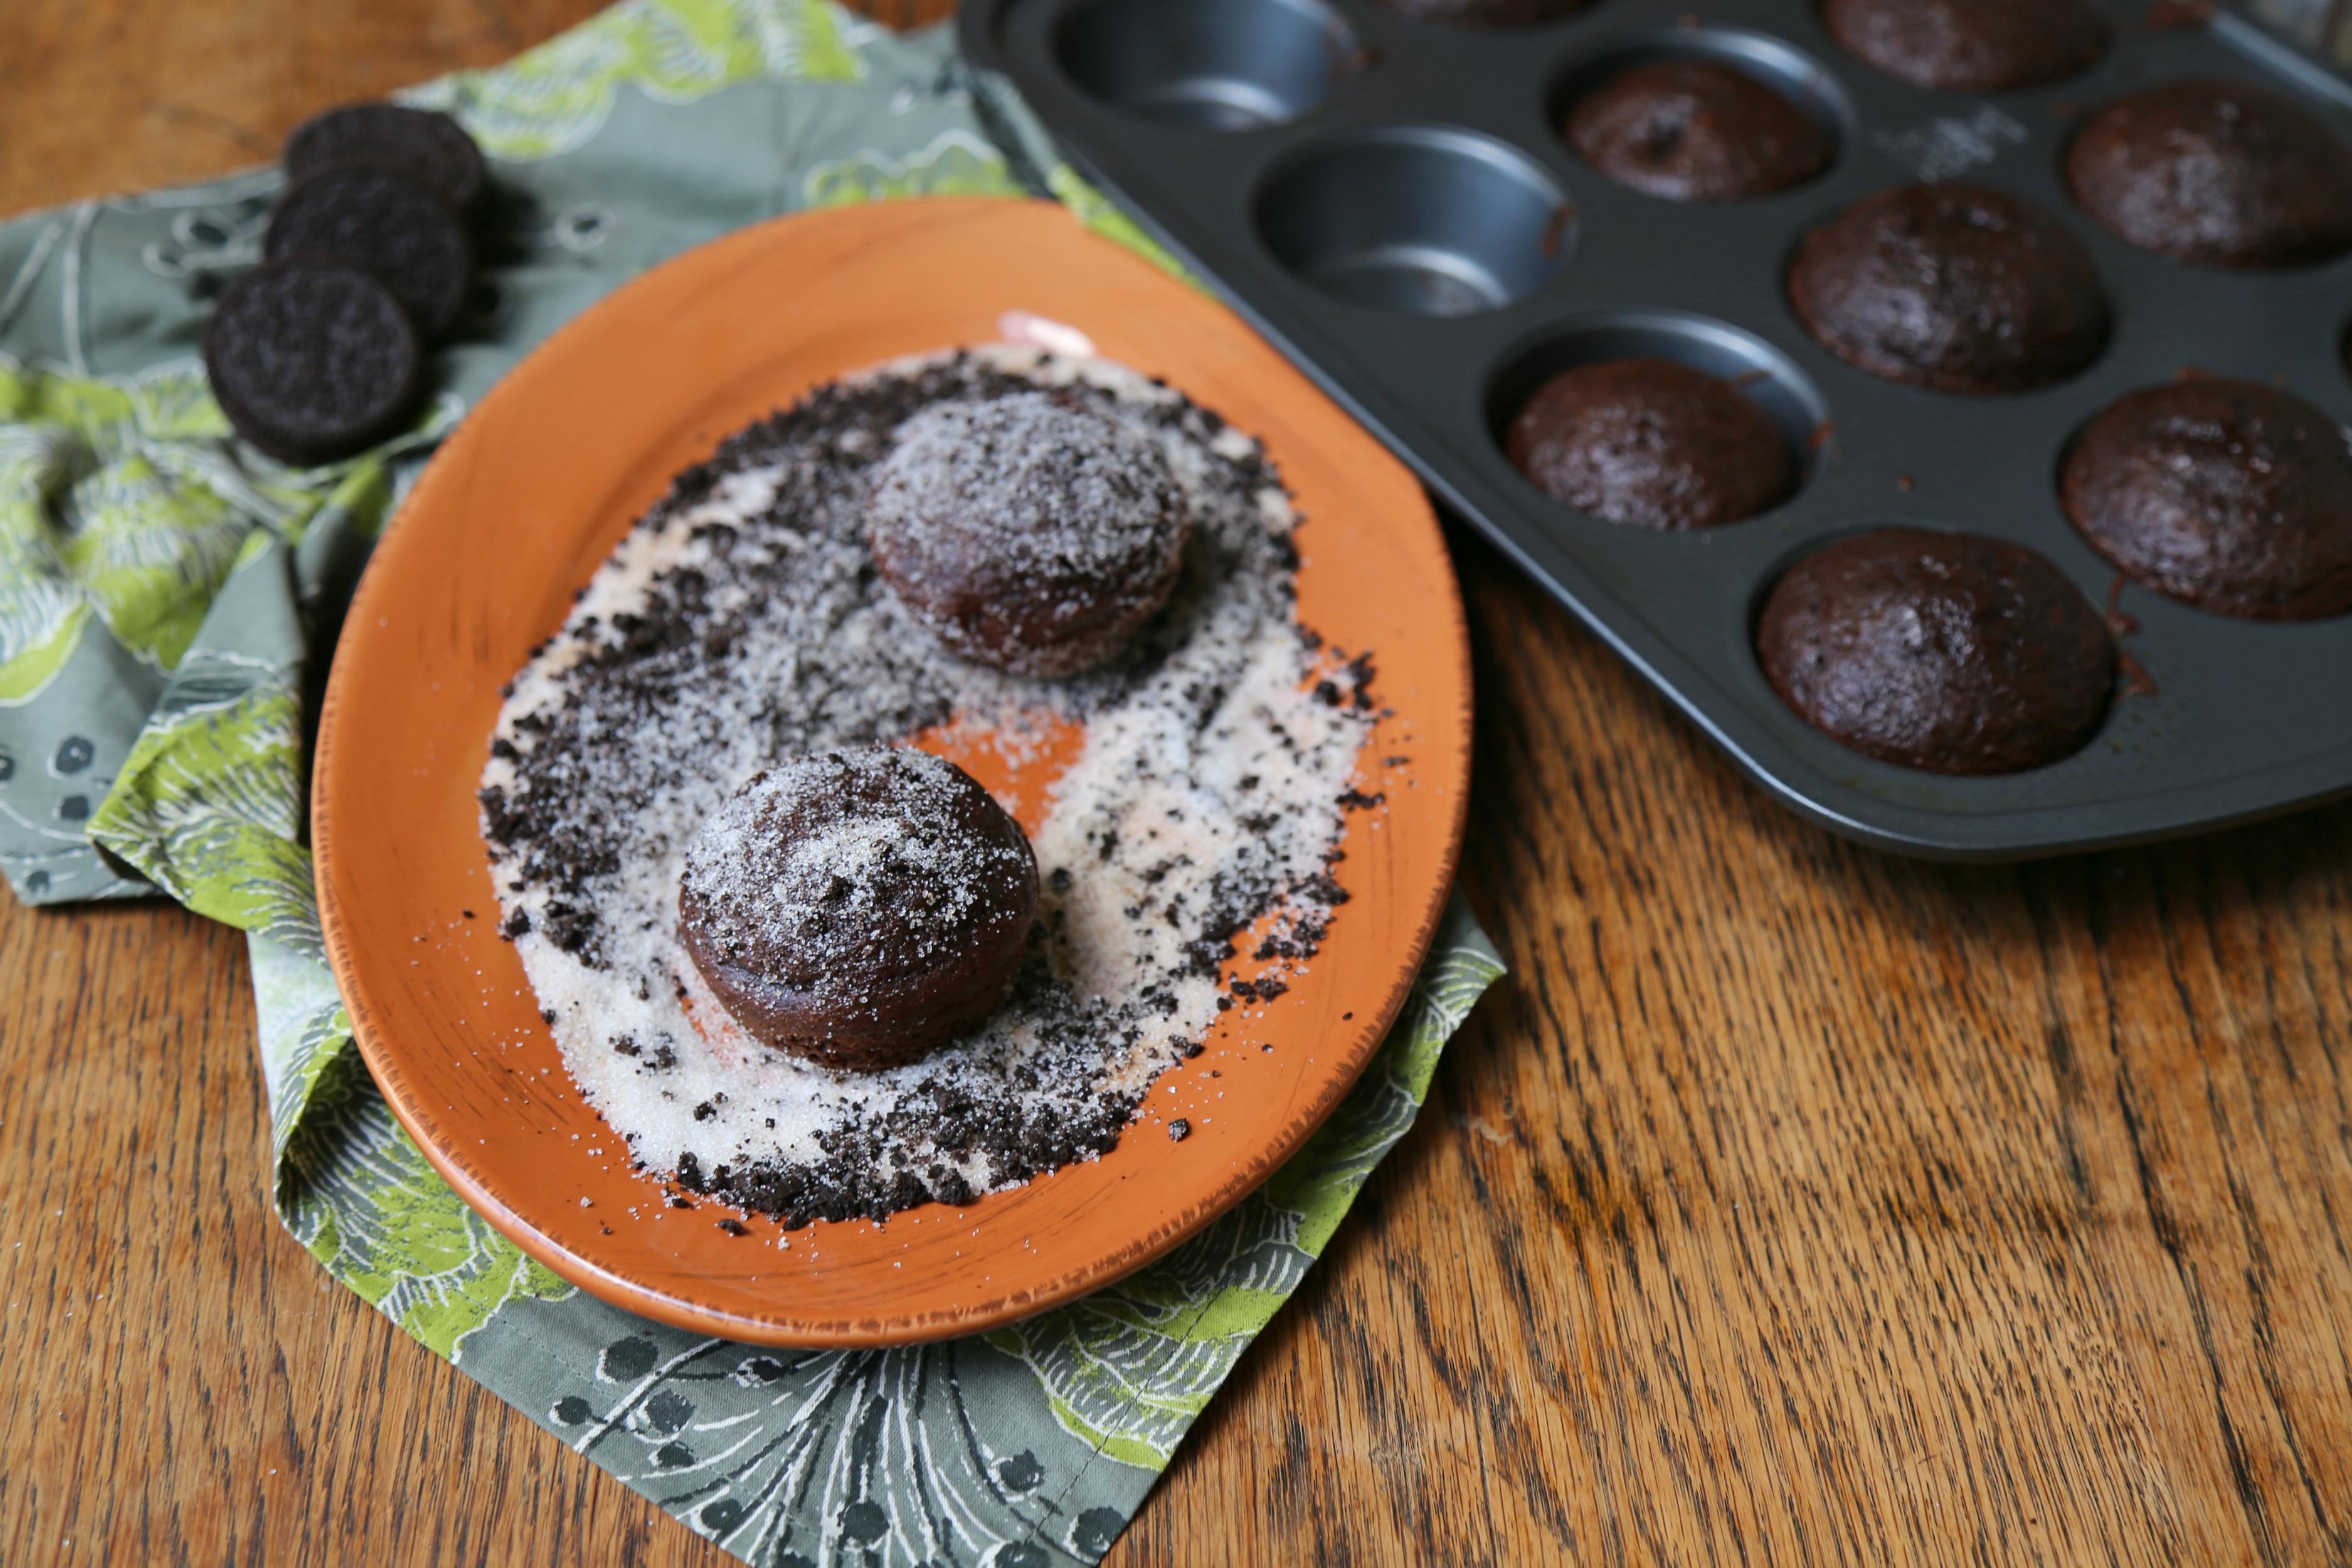 oreo-cinnamon-sugar-churro-muffins-vianneyrodriguez-sweetlifebake